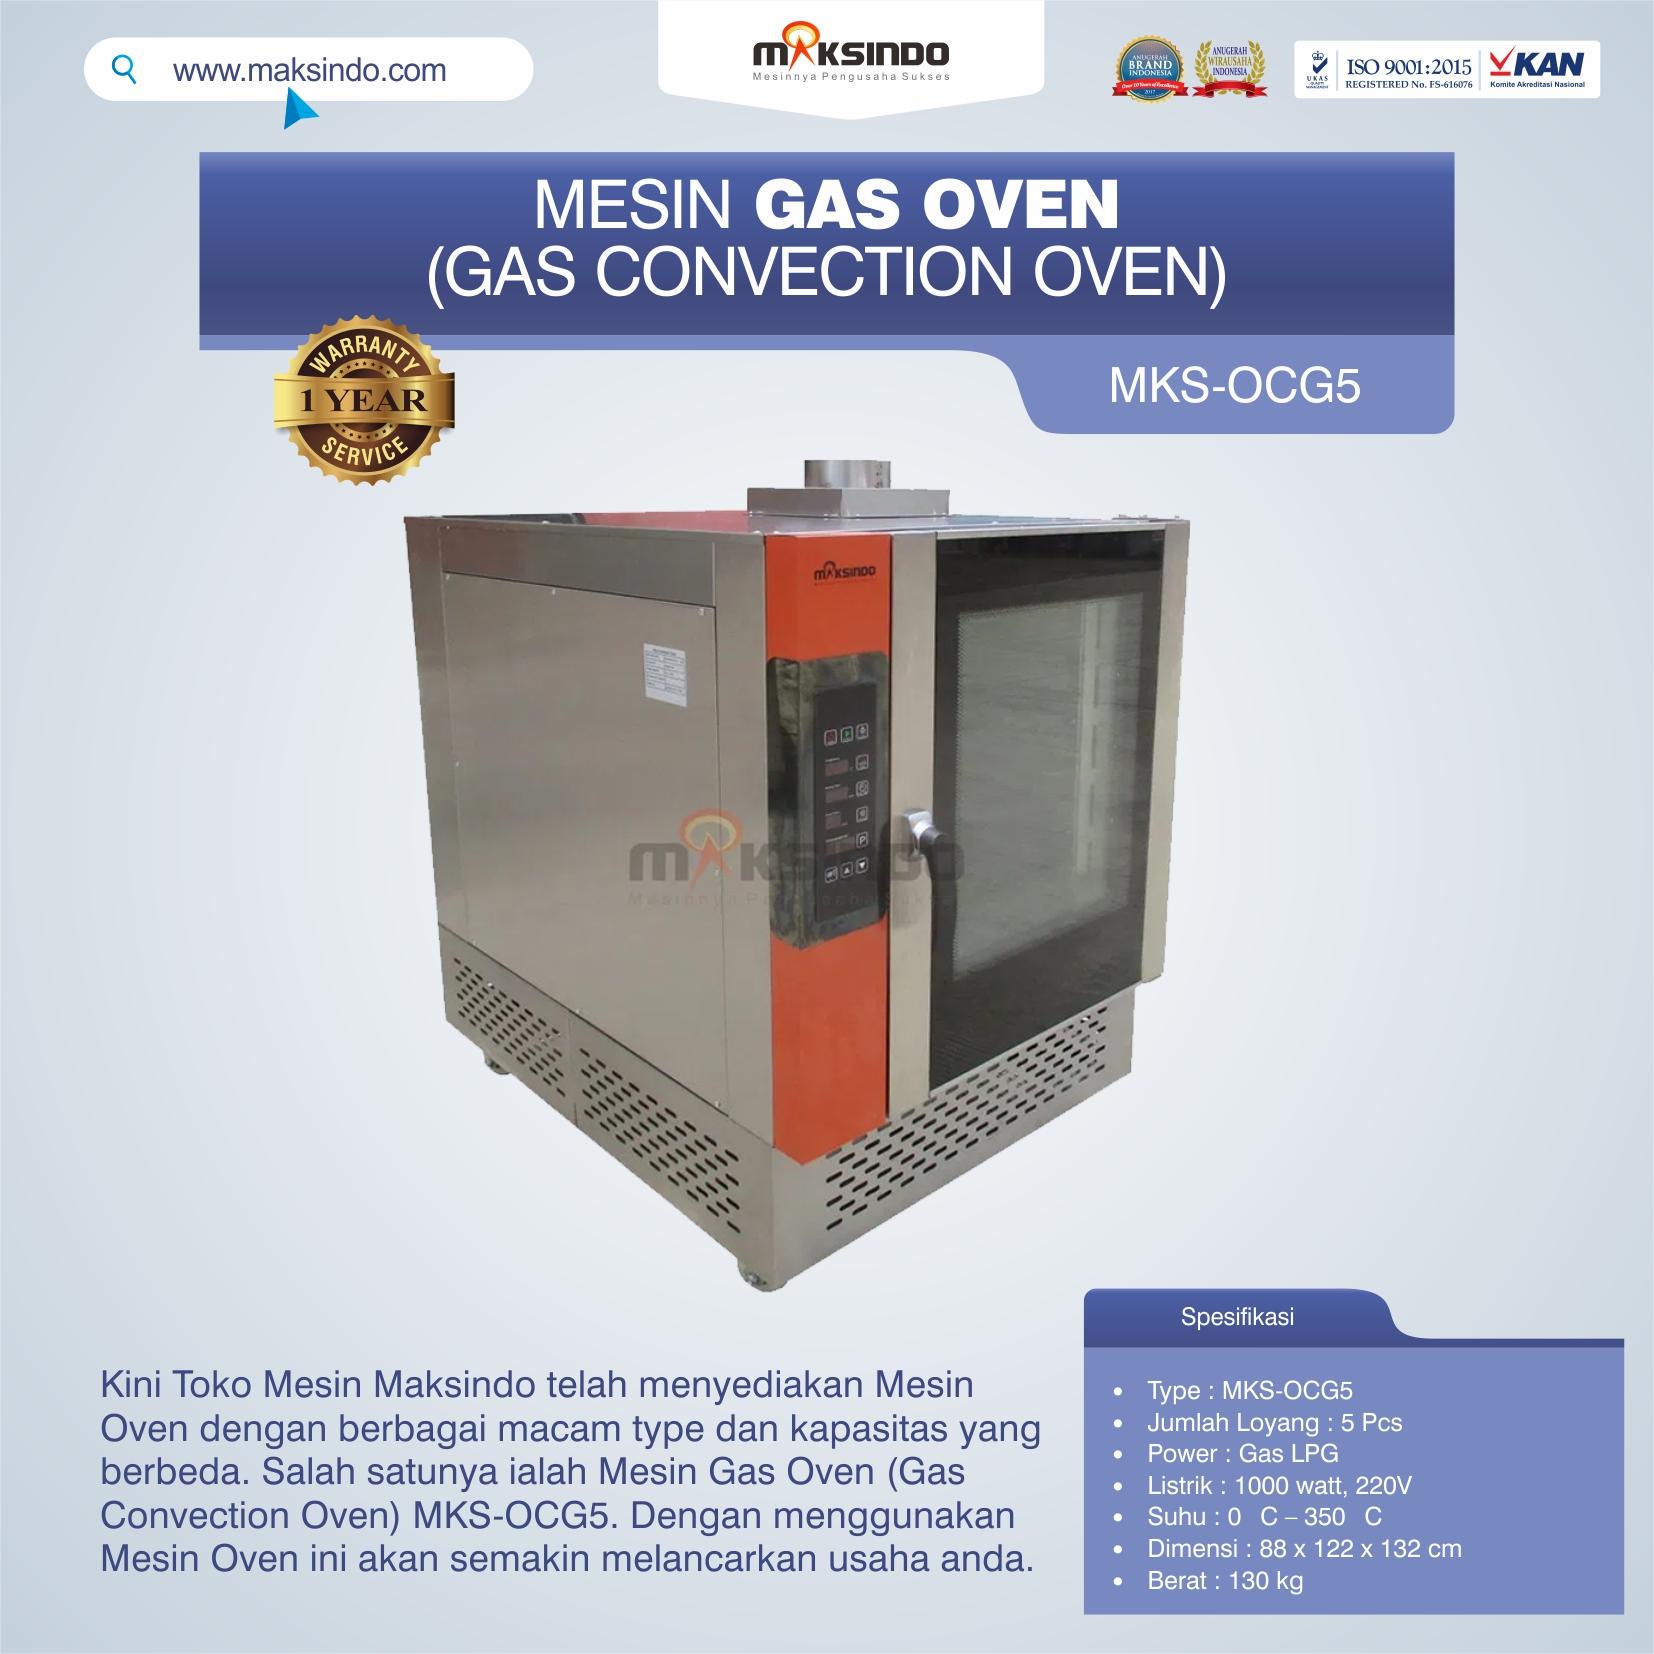 Jual Mesin Gas Oven (Gas Convection Oven) MKS-OCG5 di Mataram